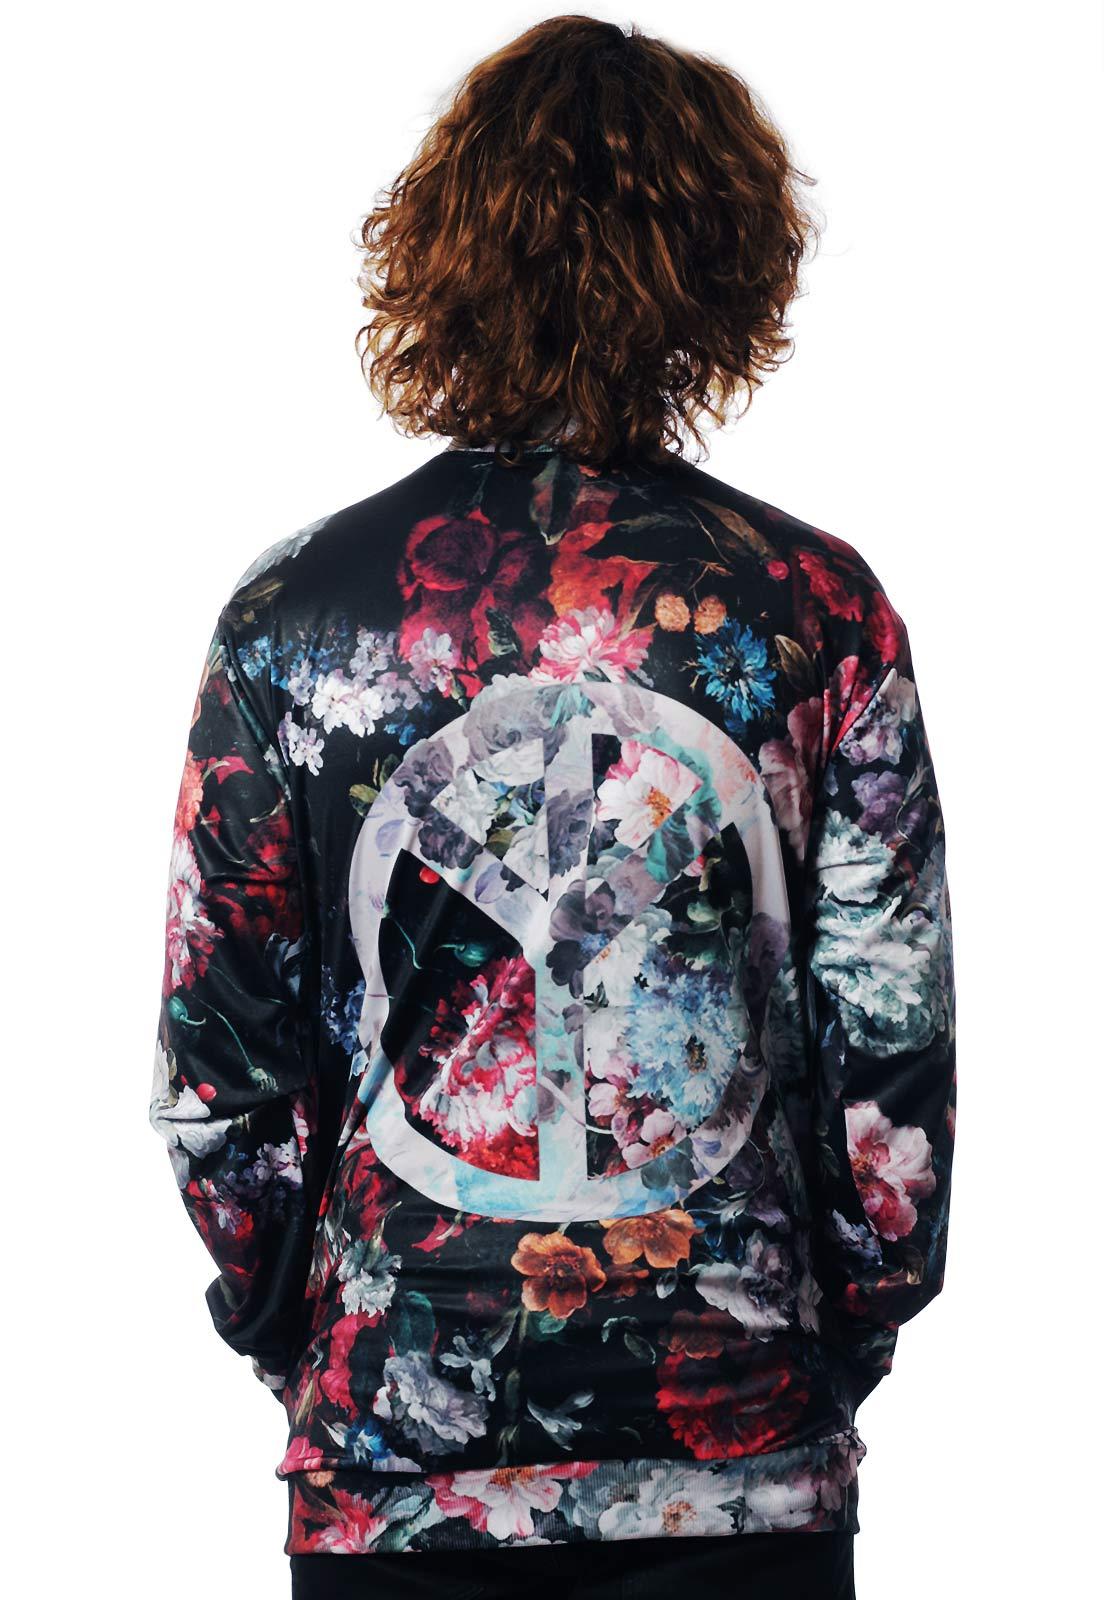 Jaqueta Bomber Floral Estampada ElephunK Full Print Unissex Peace